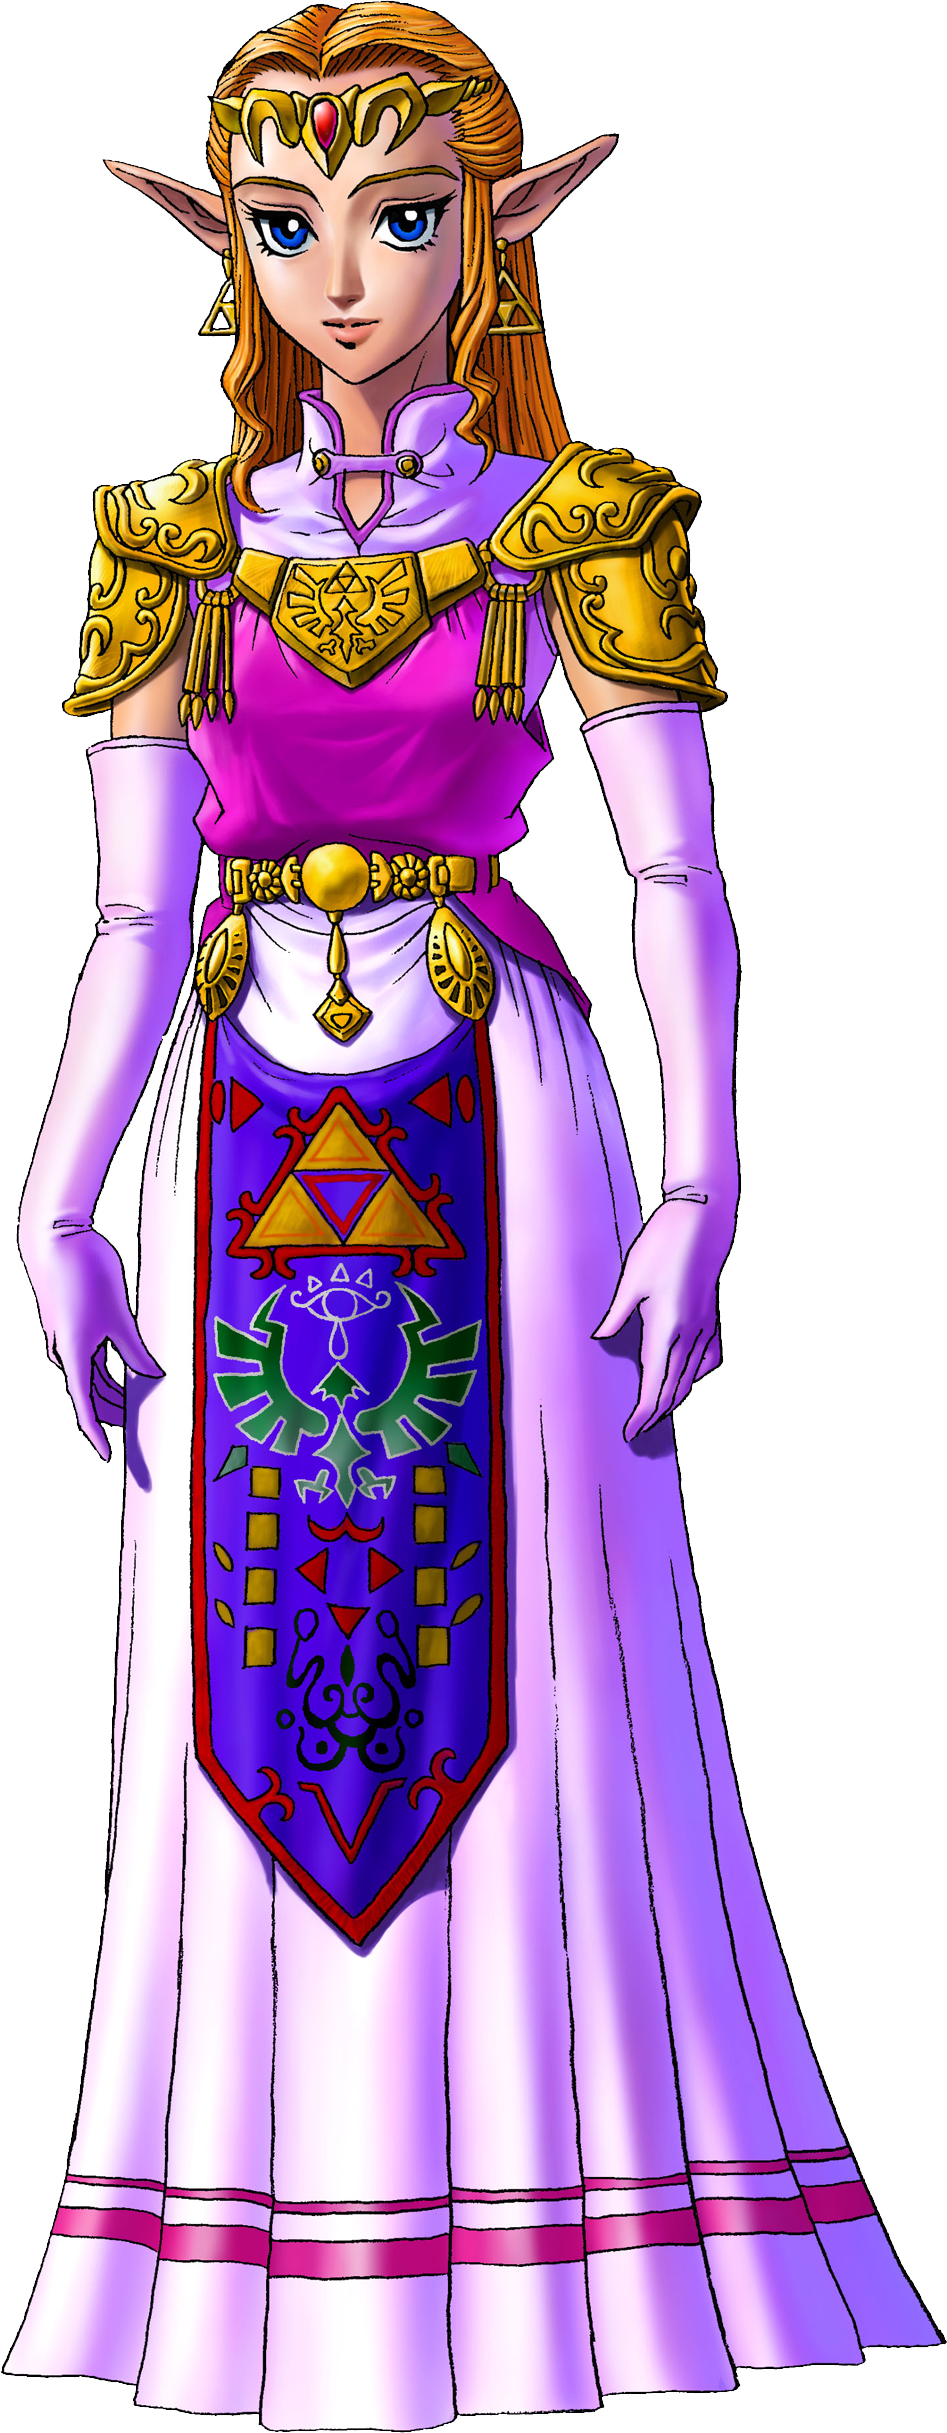 Princess zelda love interest wiki fandom powered by wikia - La princesse zelda ...